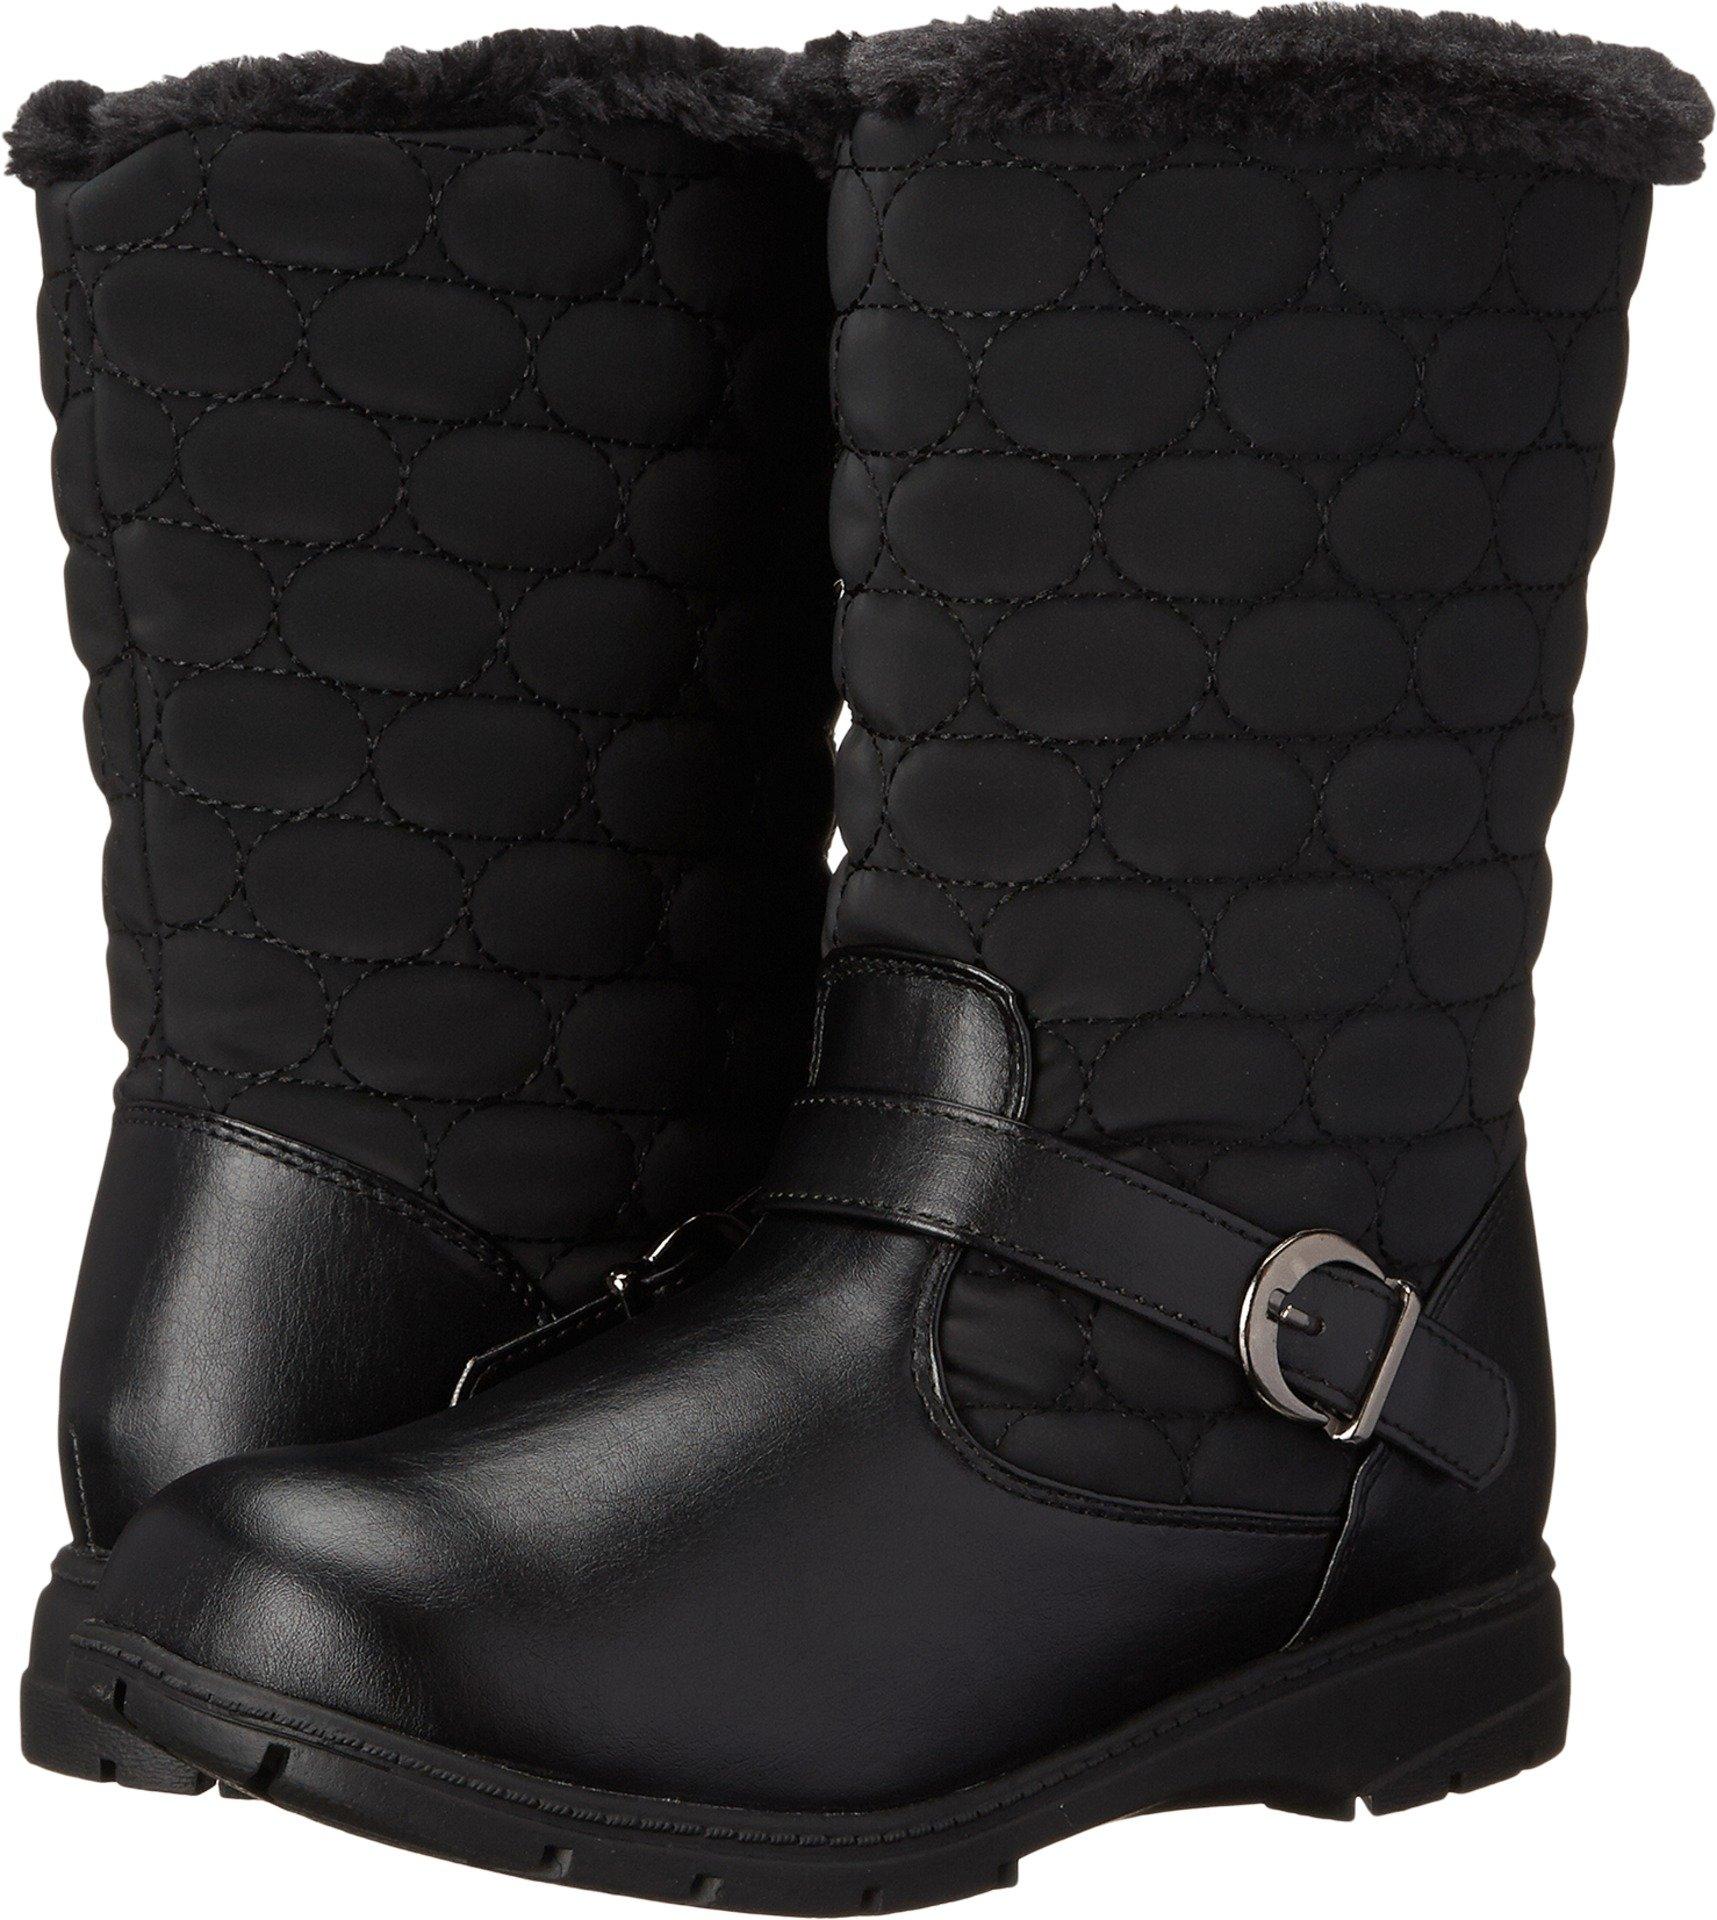 Soft Style by Hush Puppies Women's Pixie Boot, Black Vylon/Vitello, 9.5 2E US